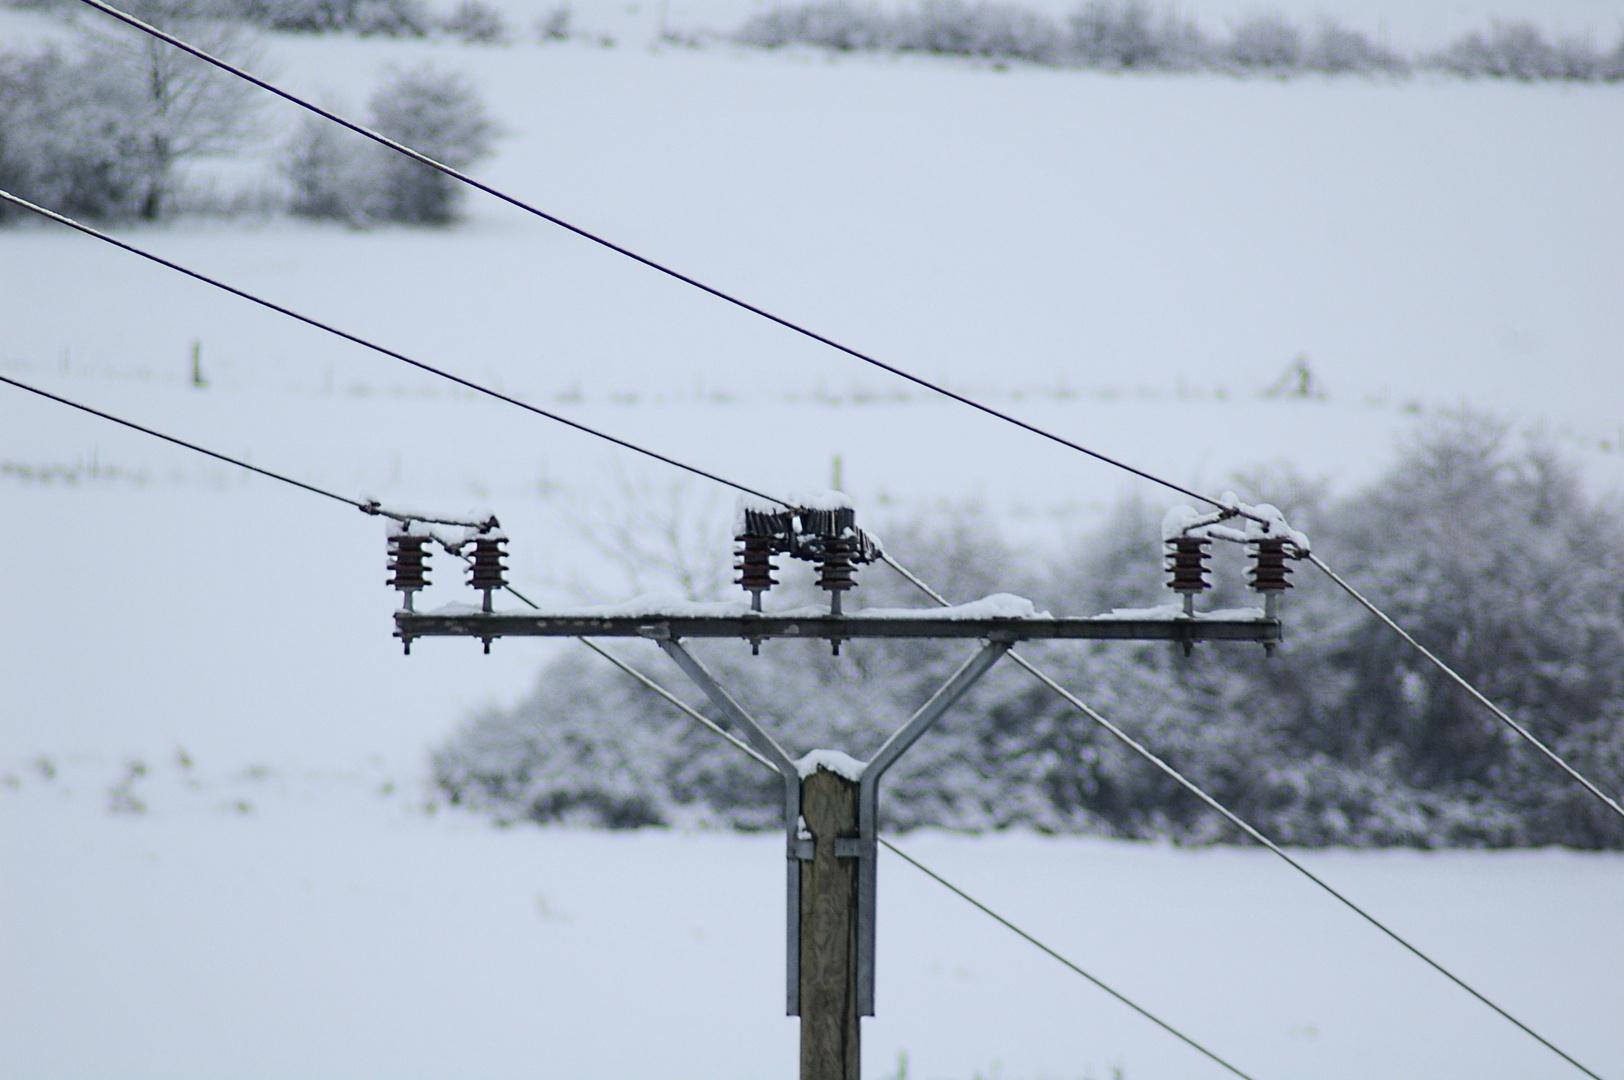 Technik trifft Winter